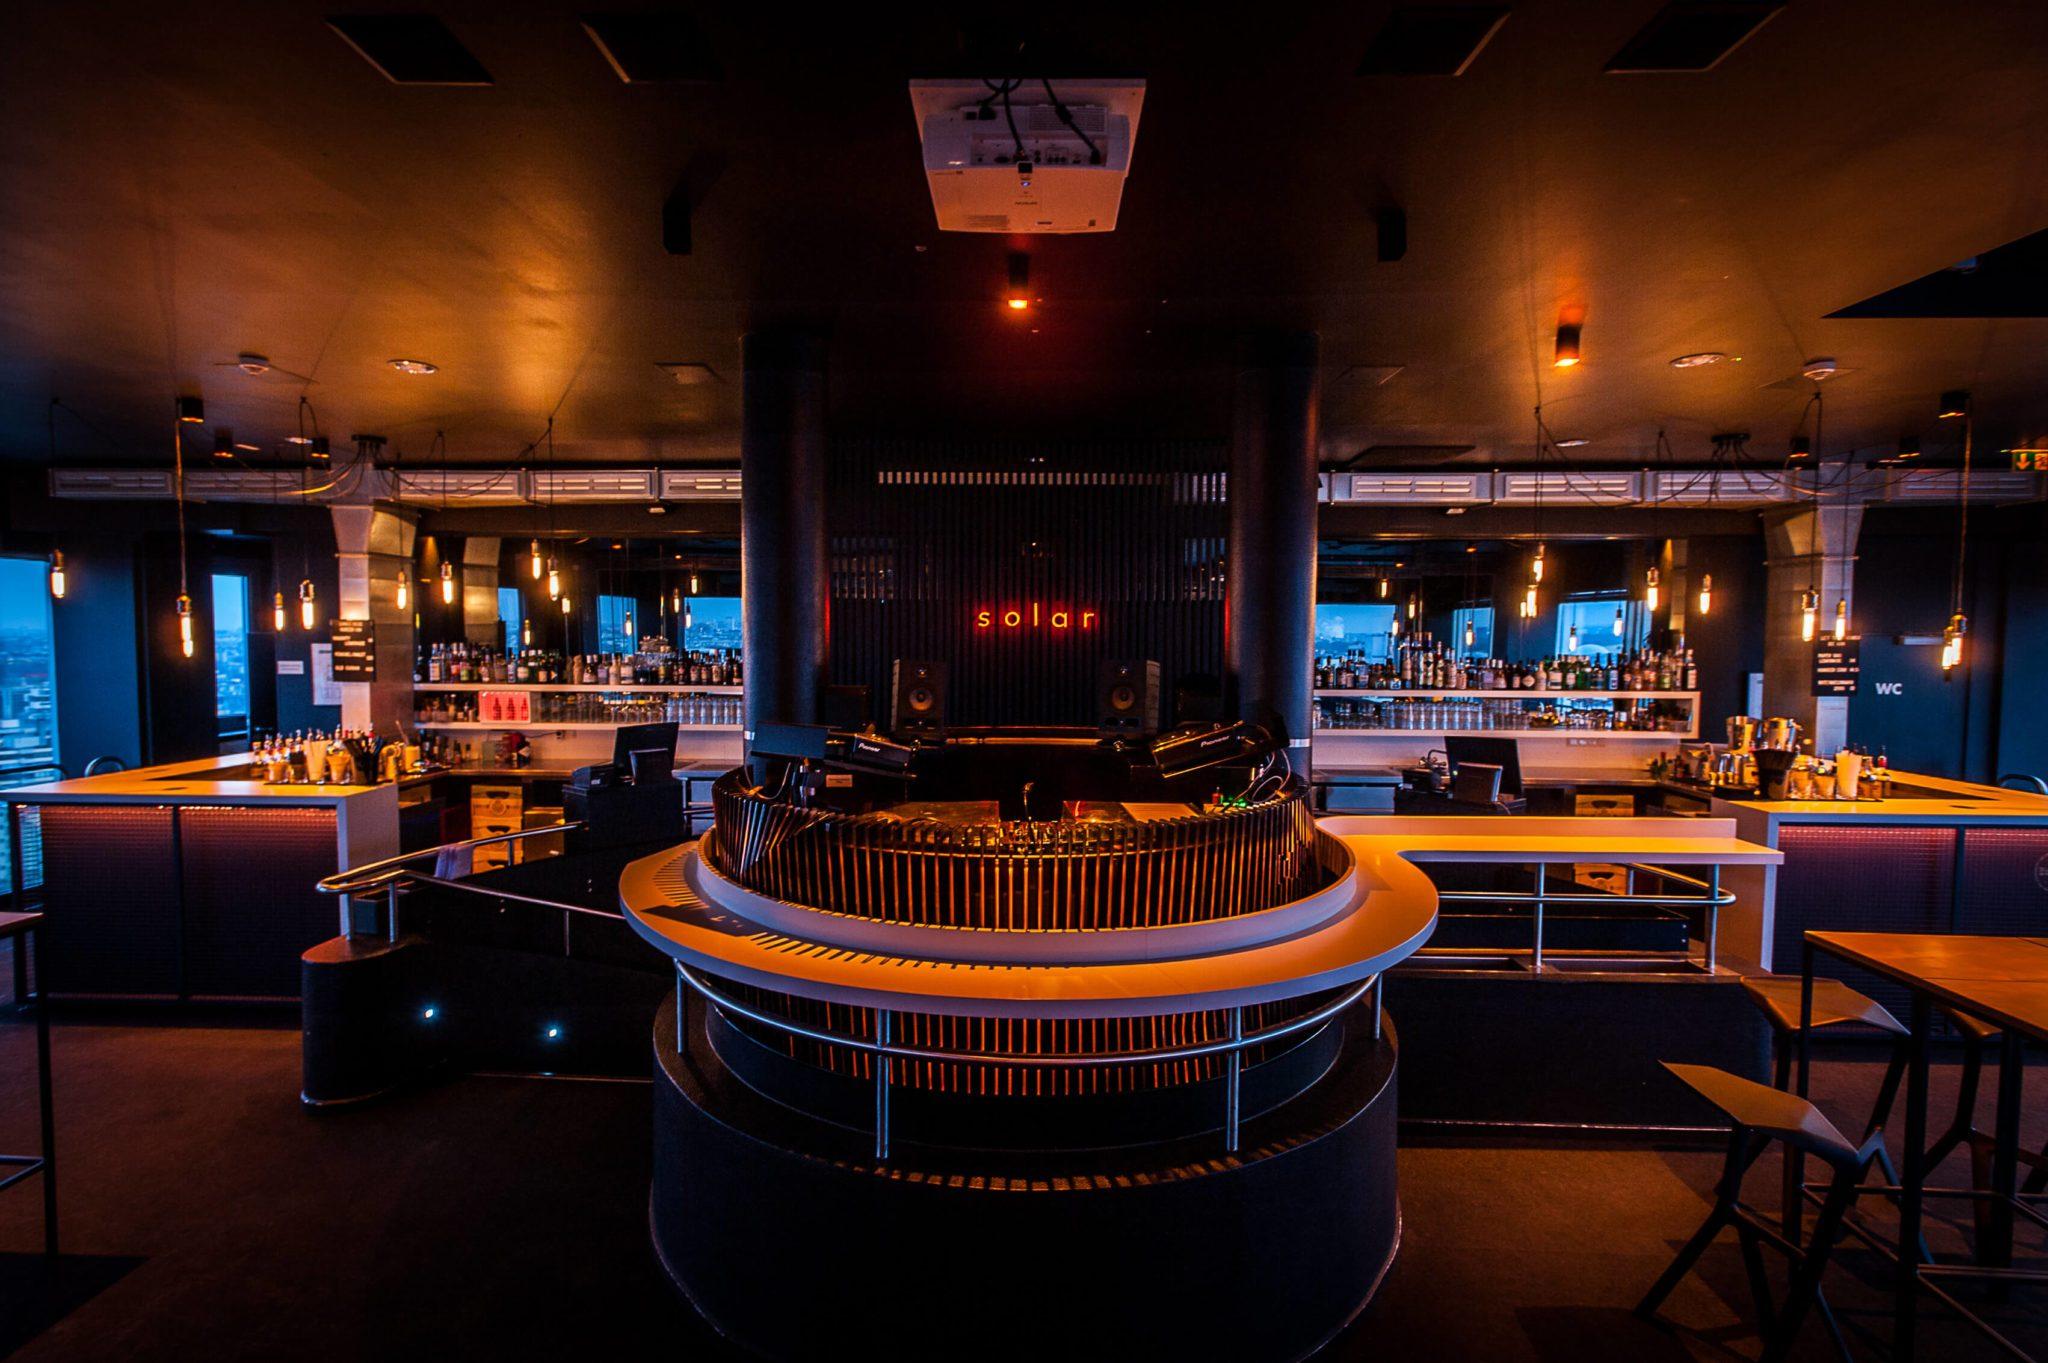 Die Bar in der Solar Sky Bar in Berlin